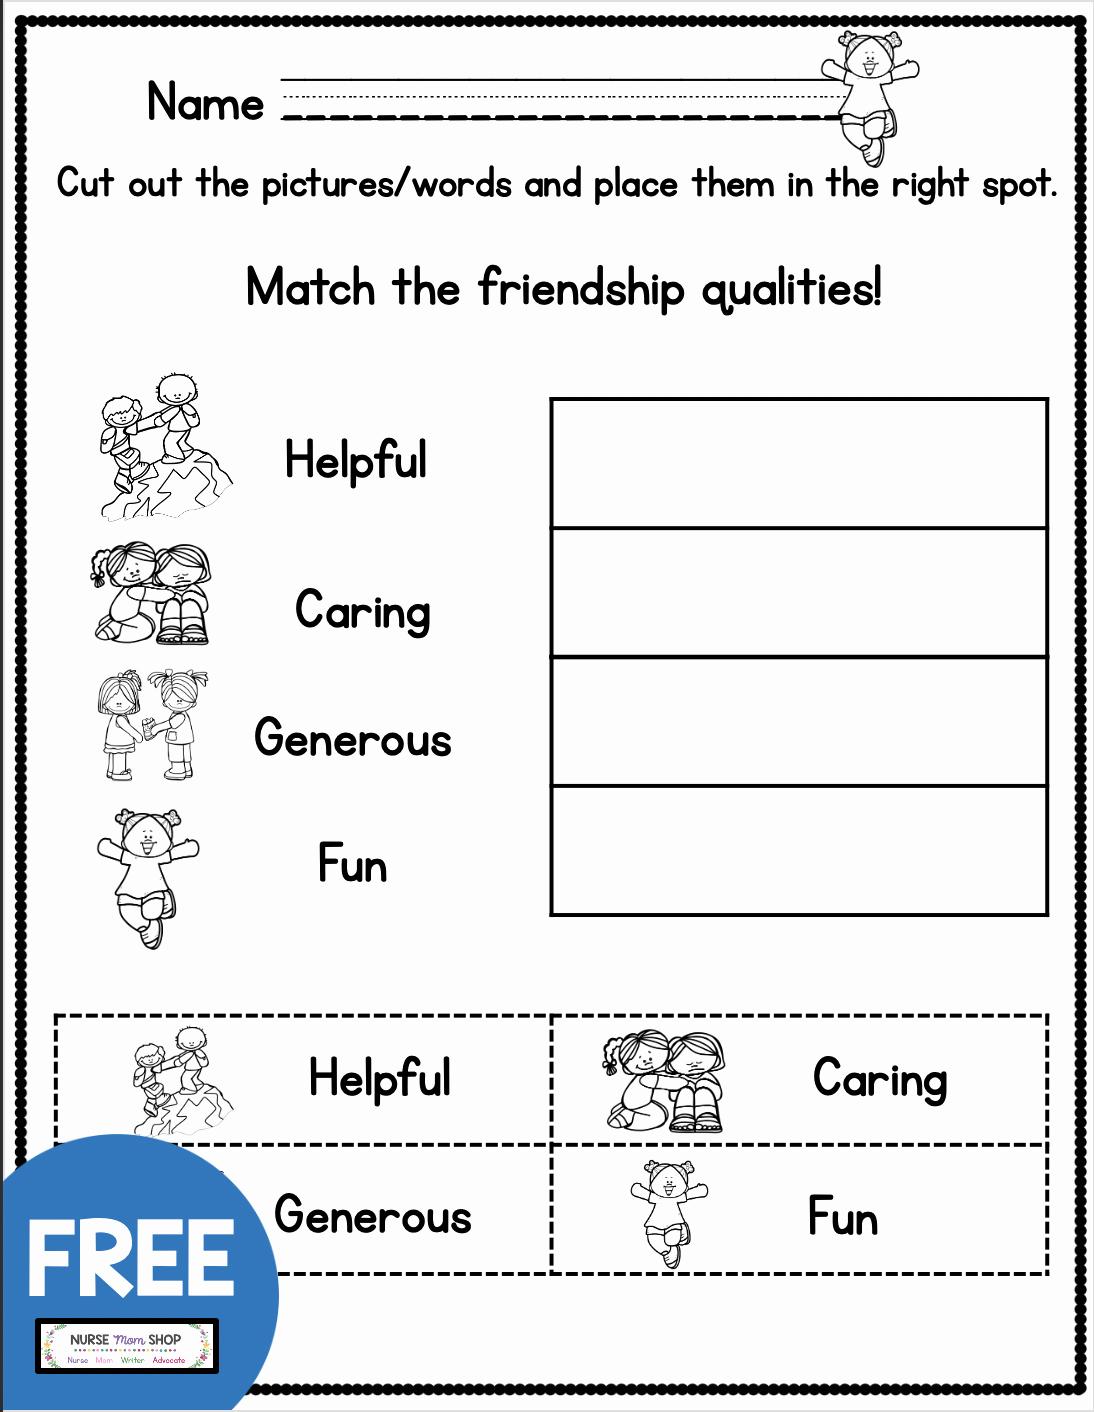 Social Skills Activities Worksheets Elegant Free Printable social Skills Worksheets Pdf thekidsworksheet